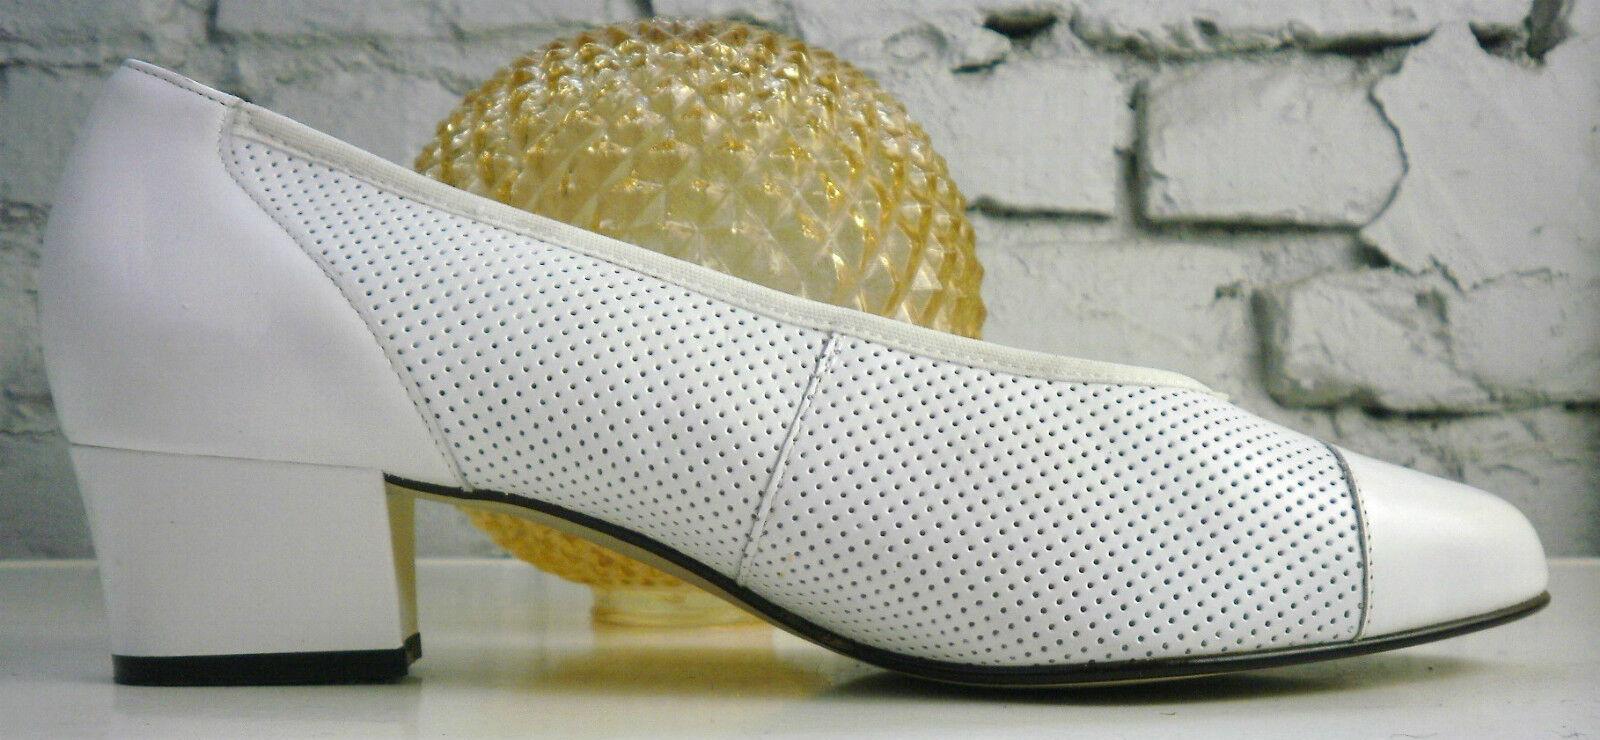 Rhin Berger Chaussures Femmes Escarpins 80er true vintage blanc blanc nos foodbed uk 4,5 G